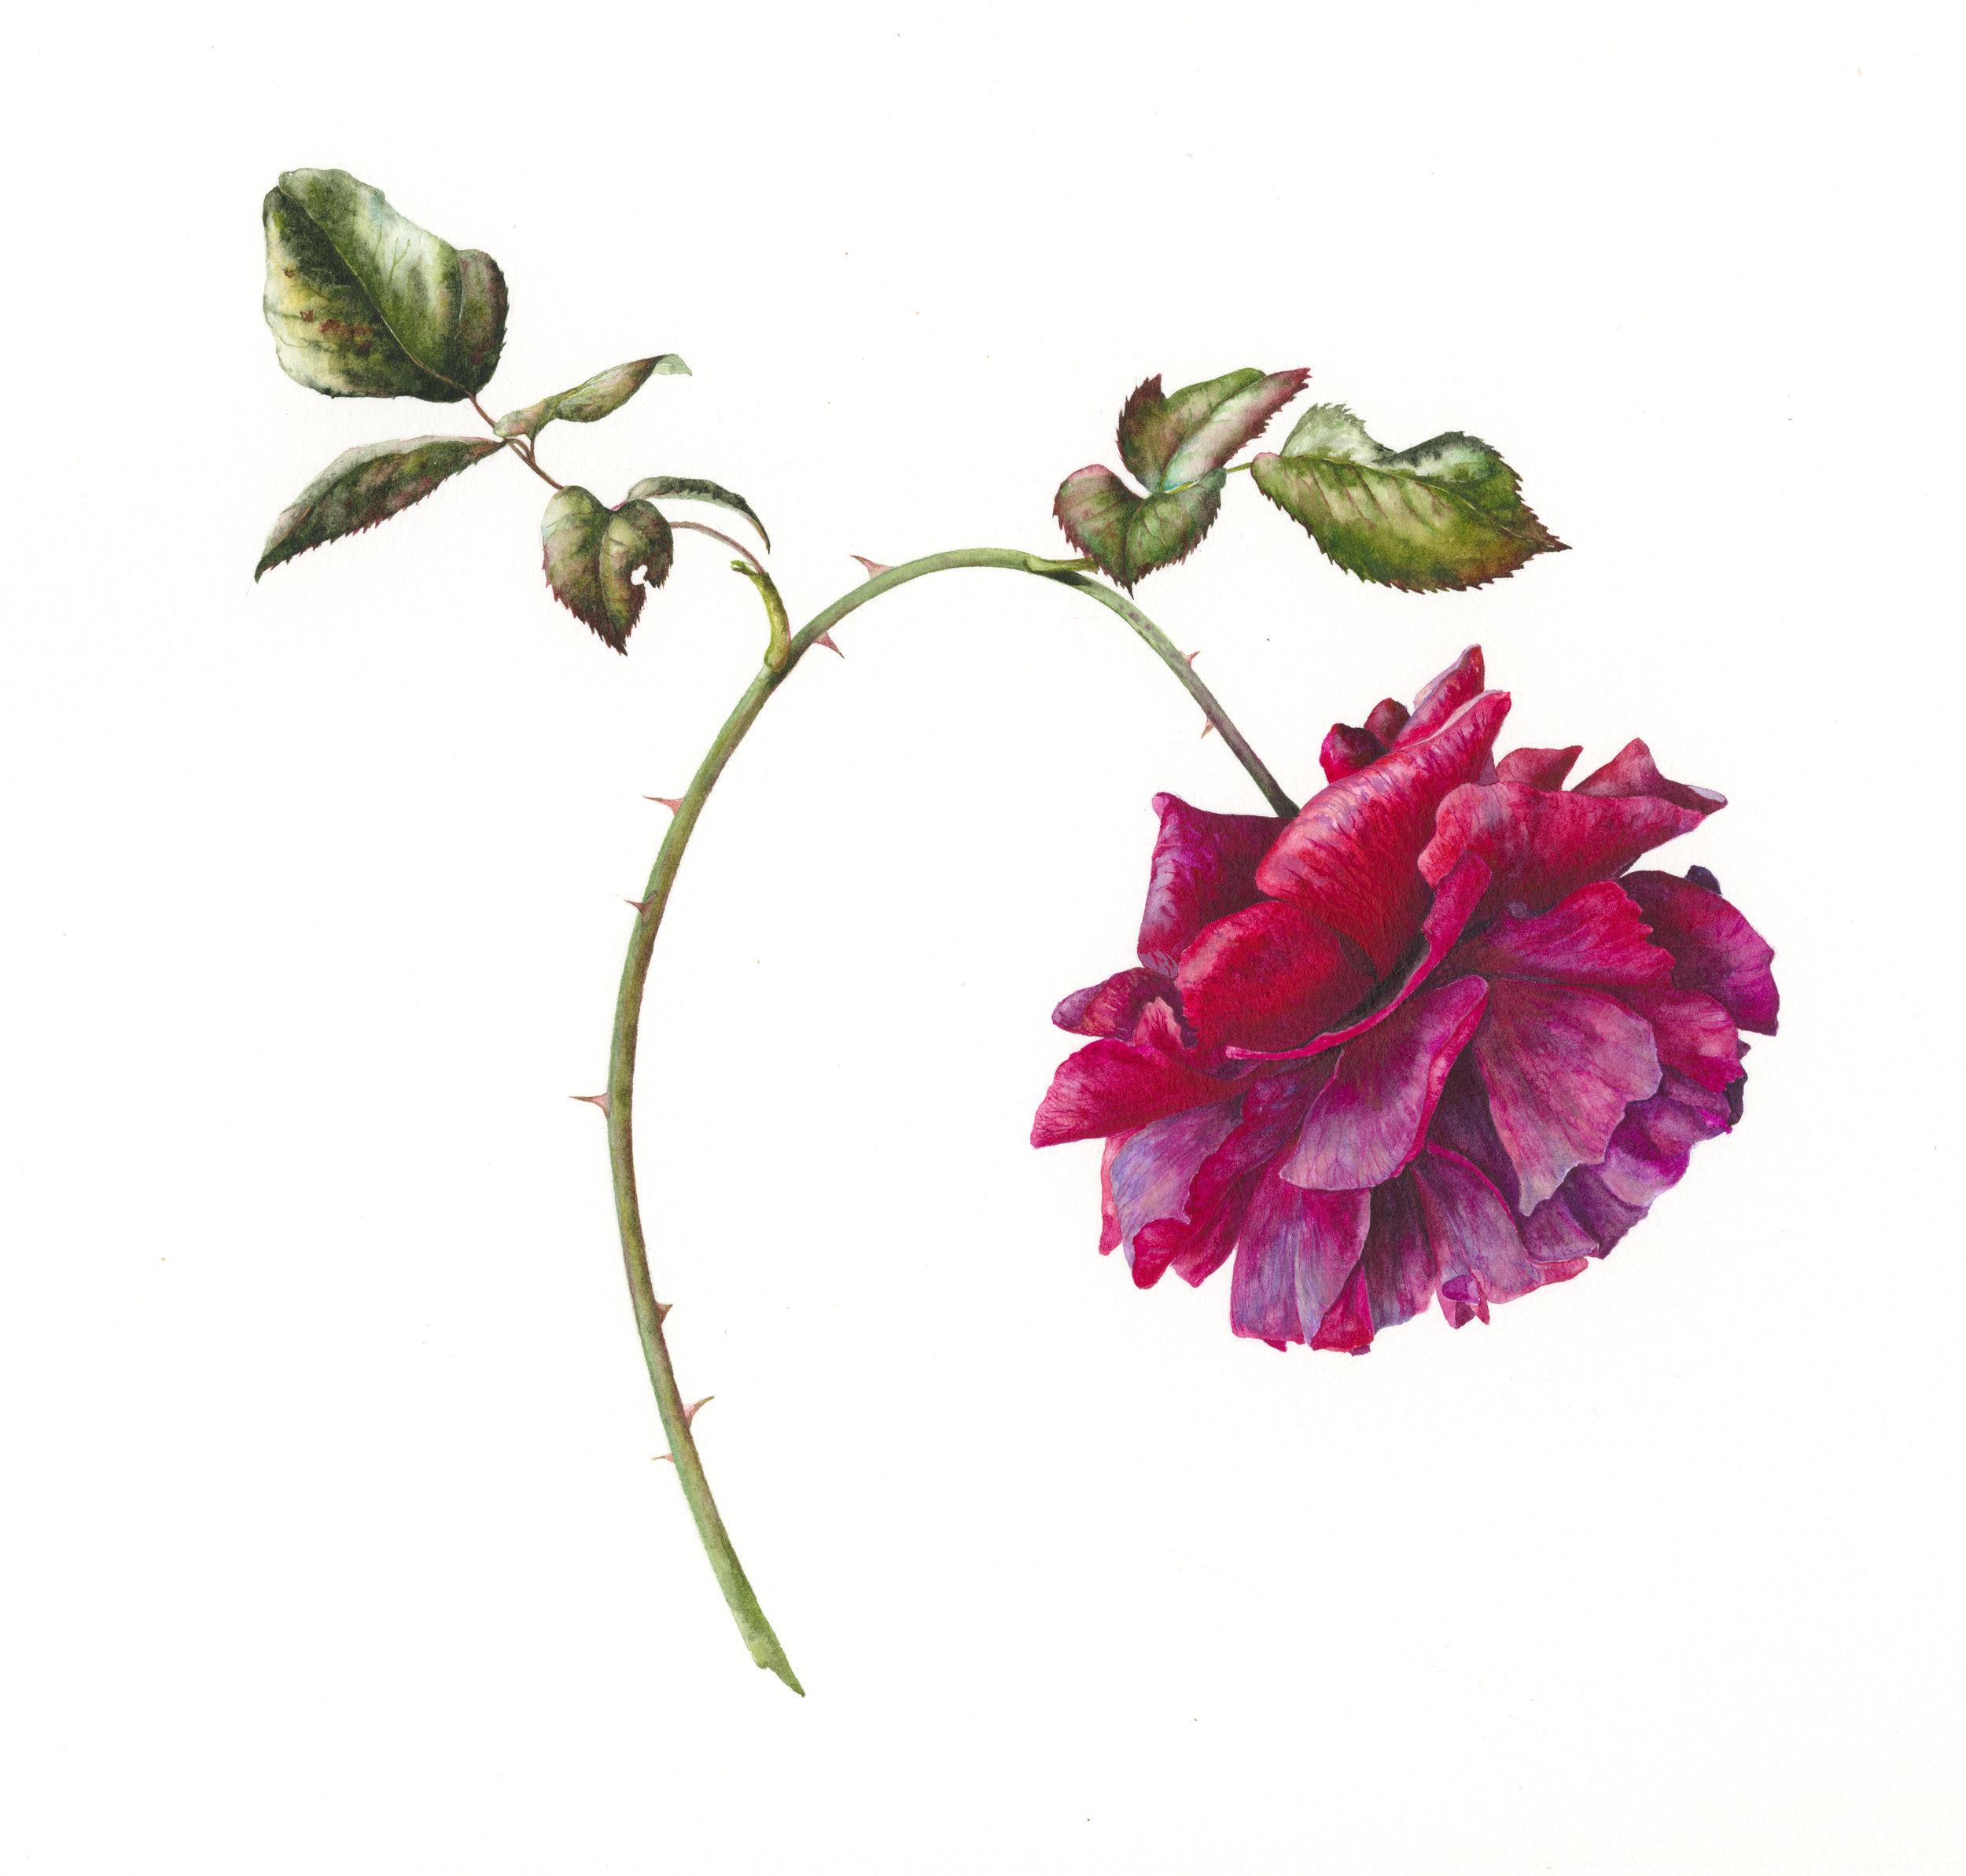 Rosa Farruca  watercolour on paper  31 x 31 cm image  54 x 54 cm framed  SOLD